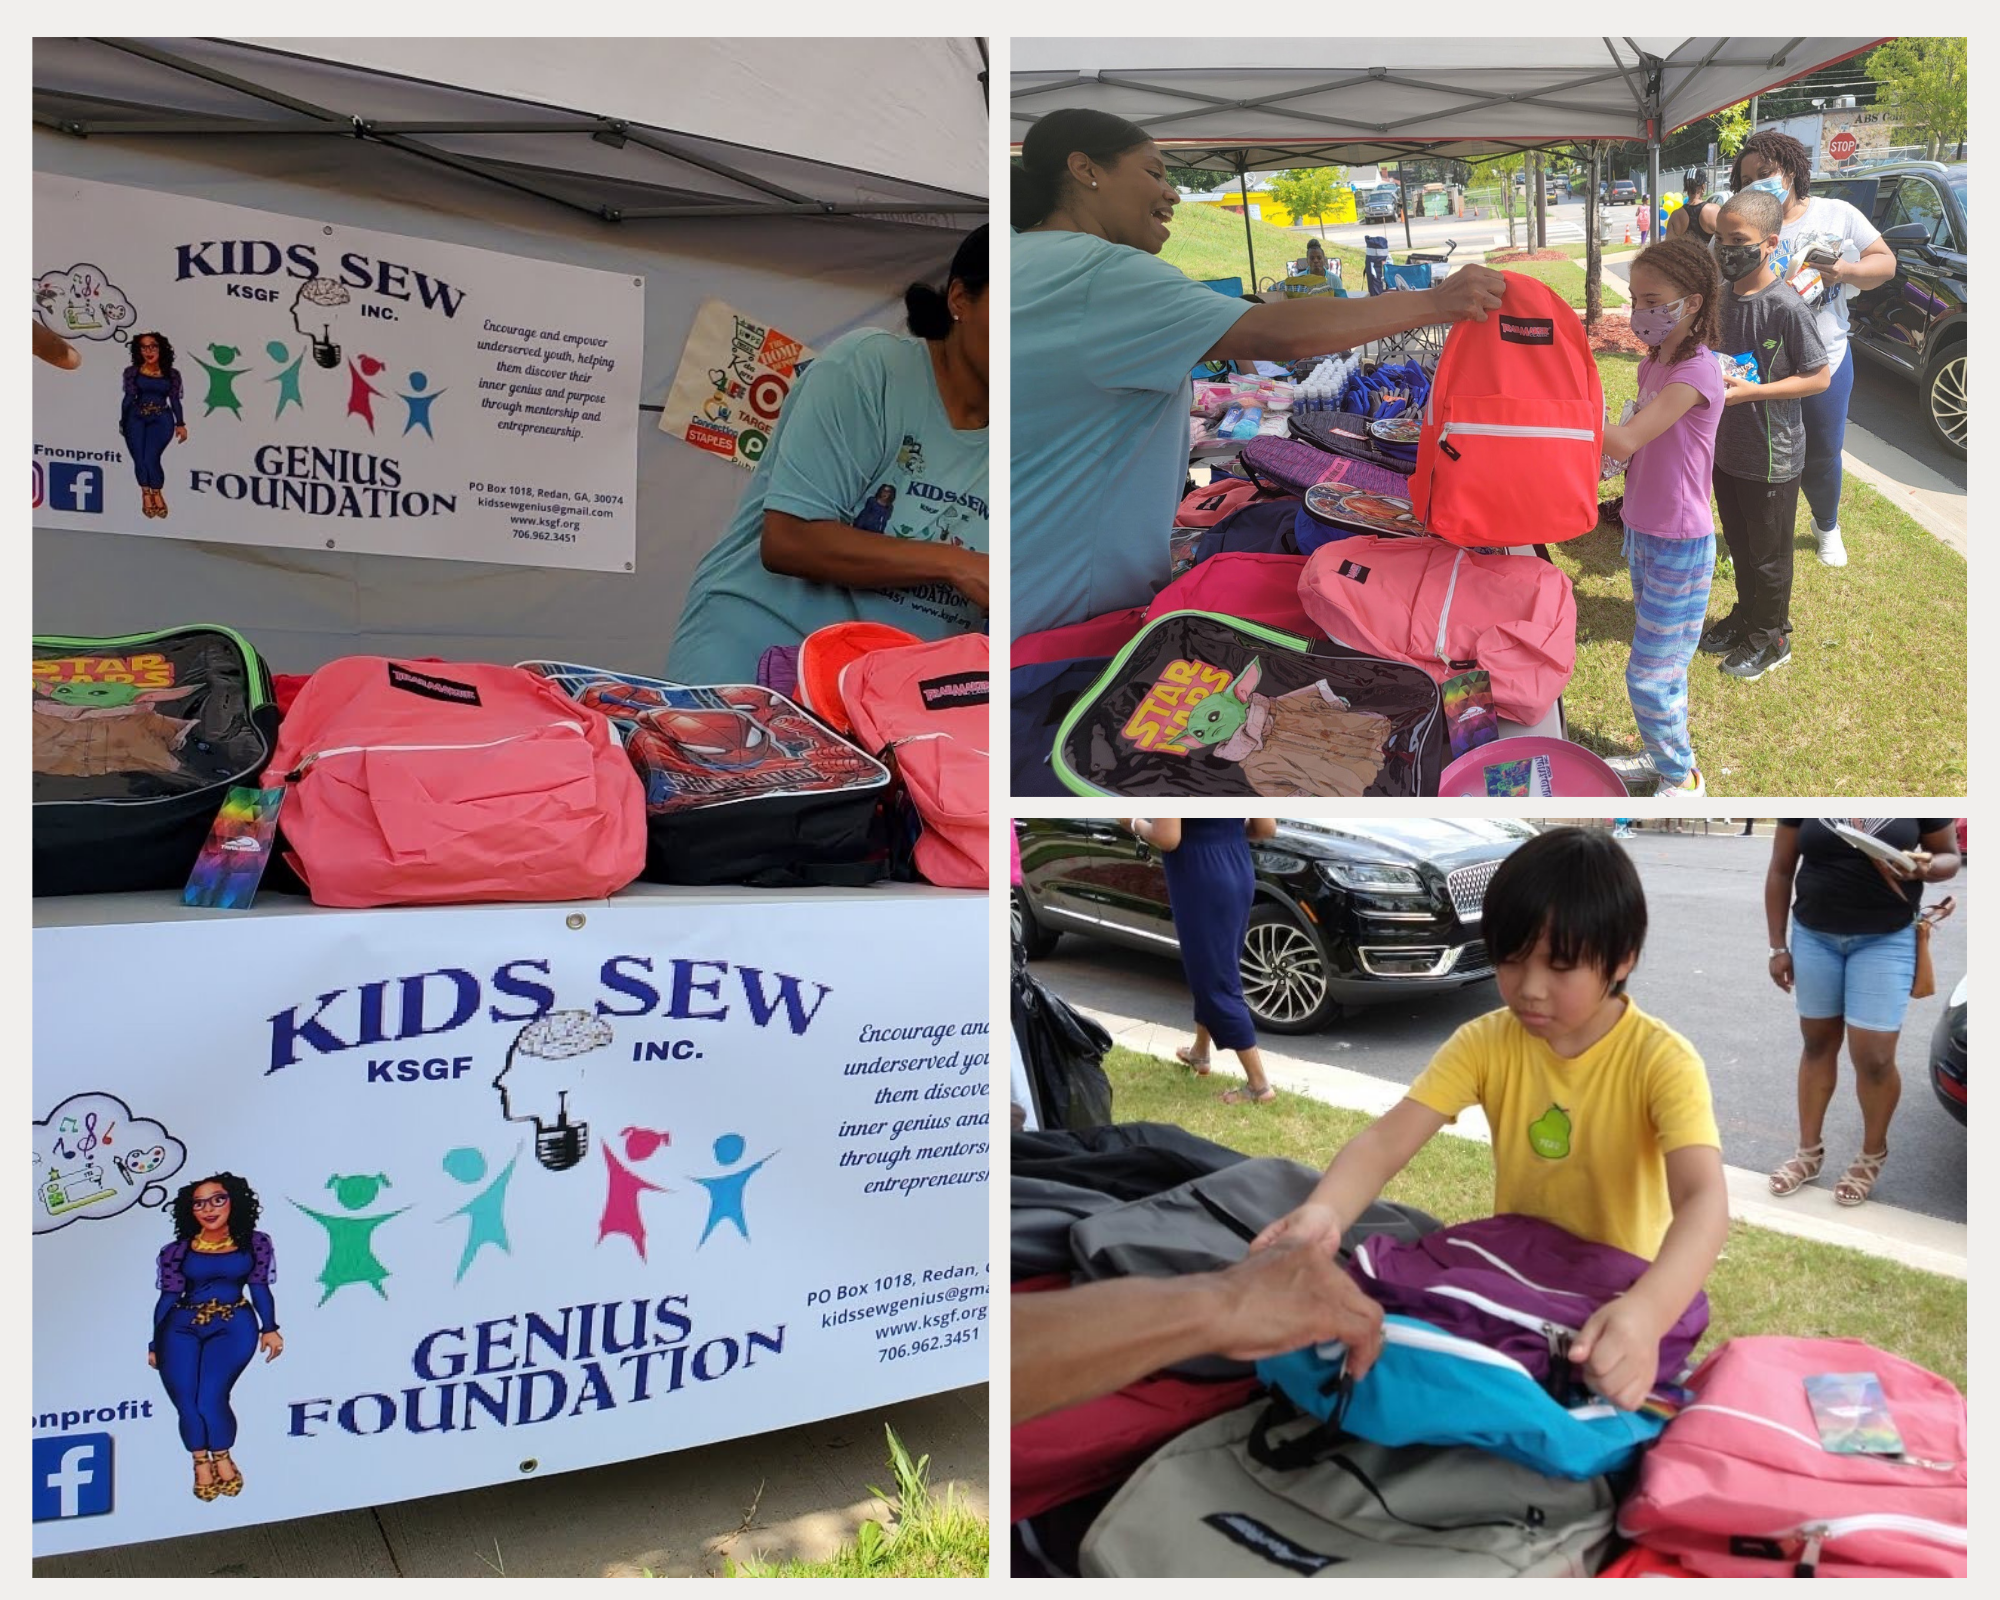 Recent Events - Kids Sew Genius Foundation